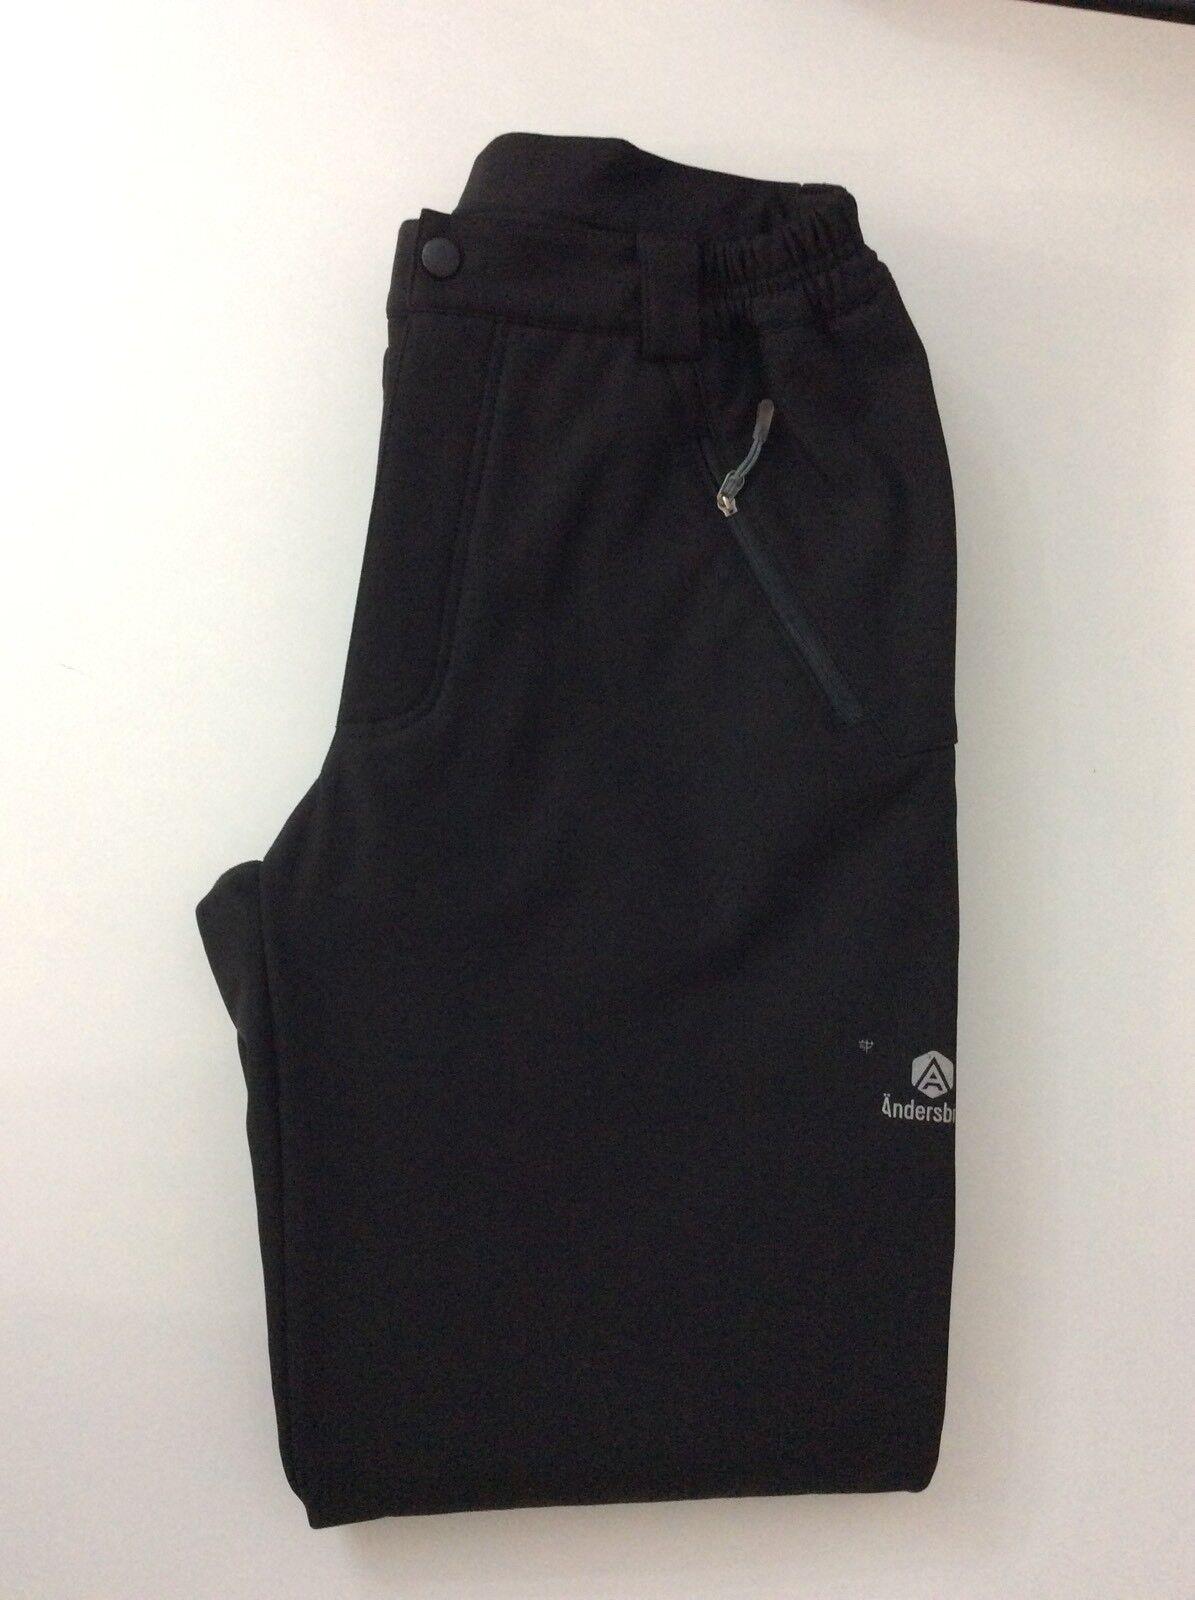 "Andersbrug Mens Walking Trousers, Padded, Neoprene, Size Small, Waist 28-32"" Vgc"